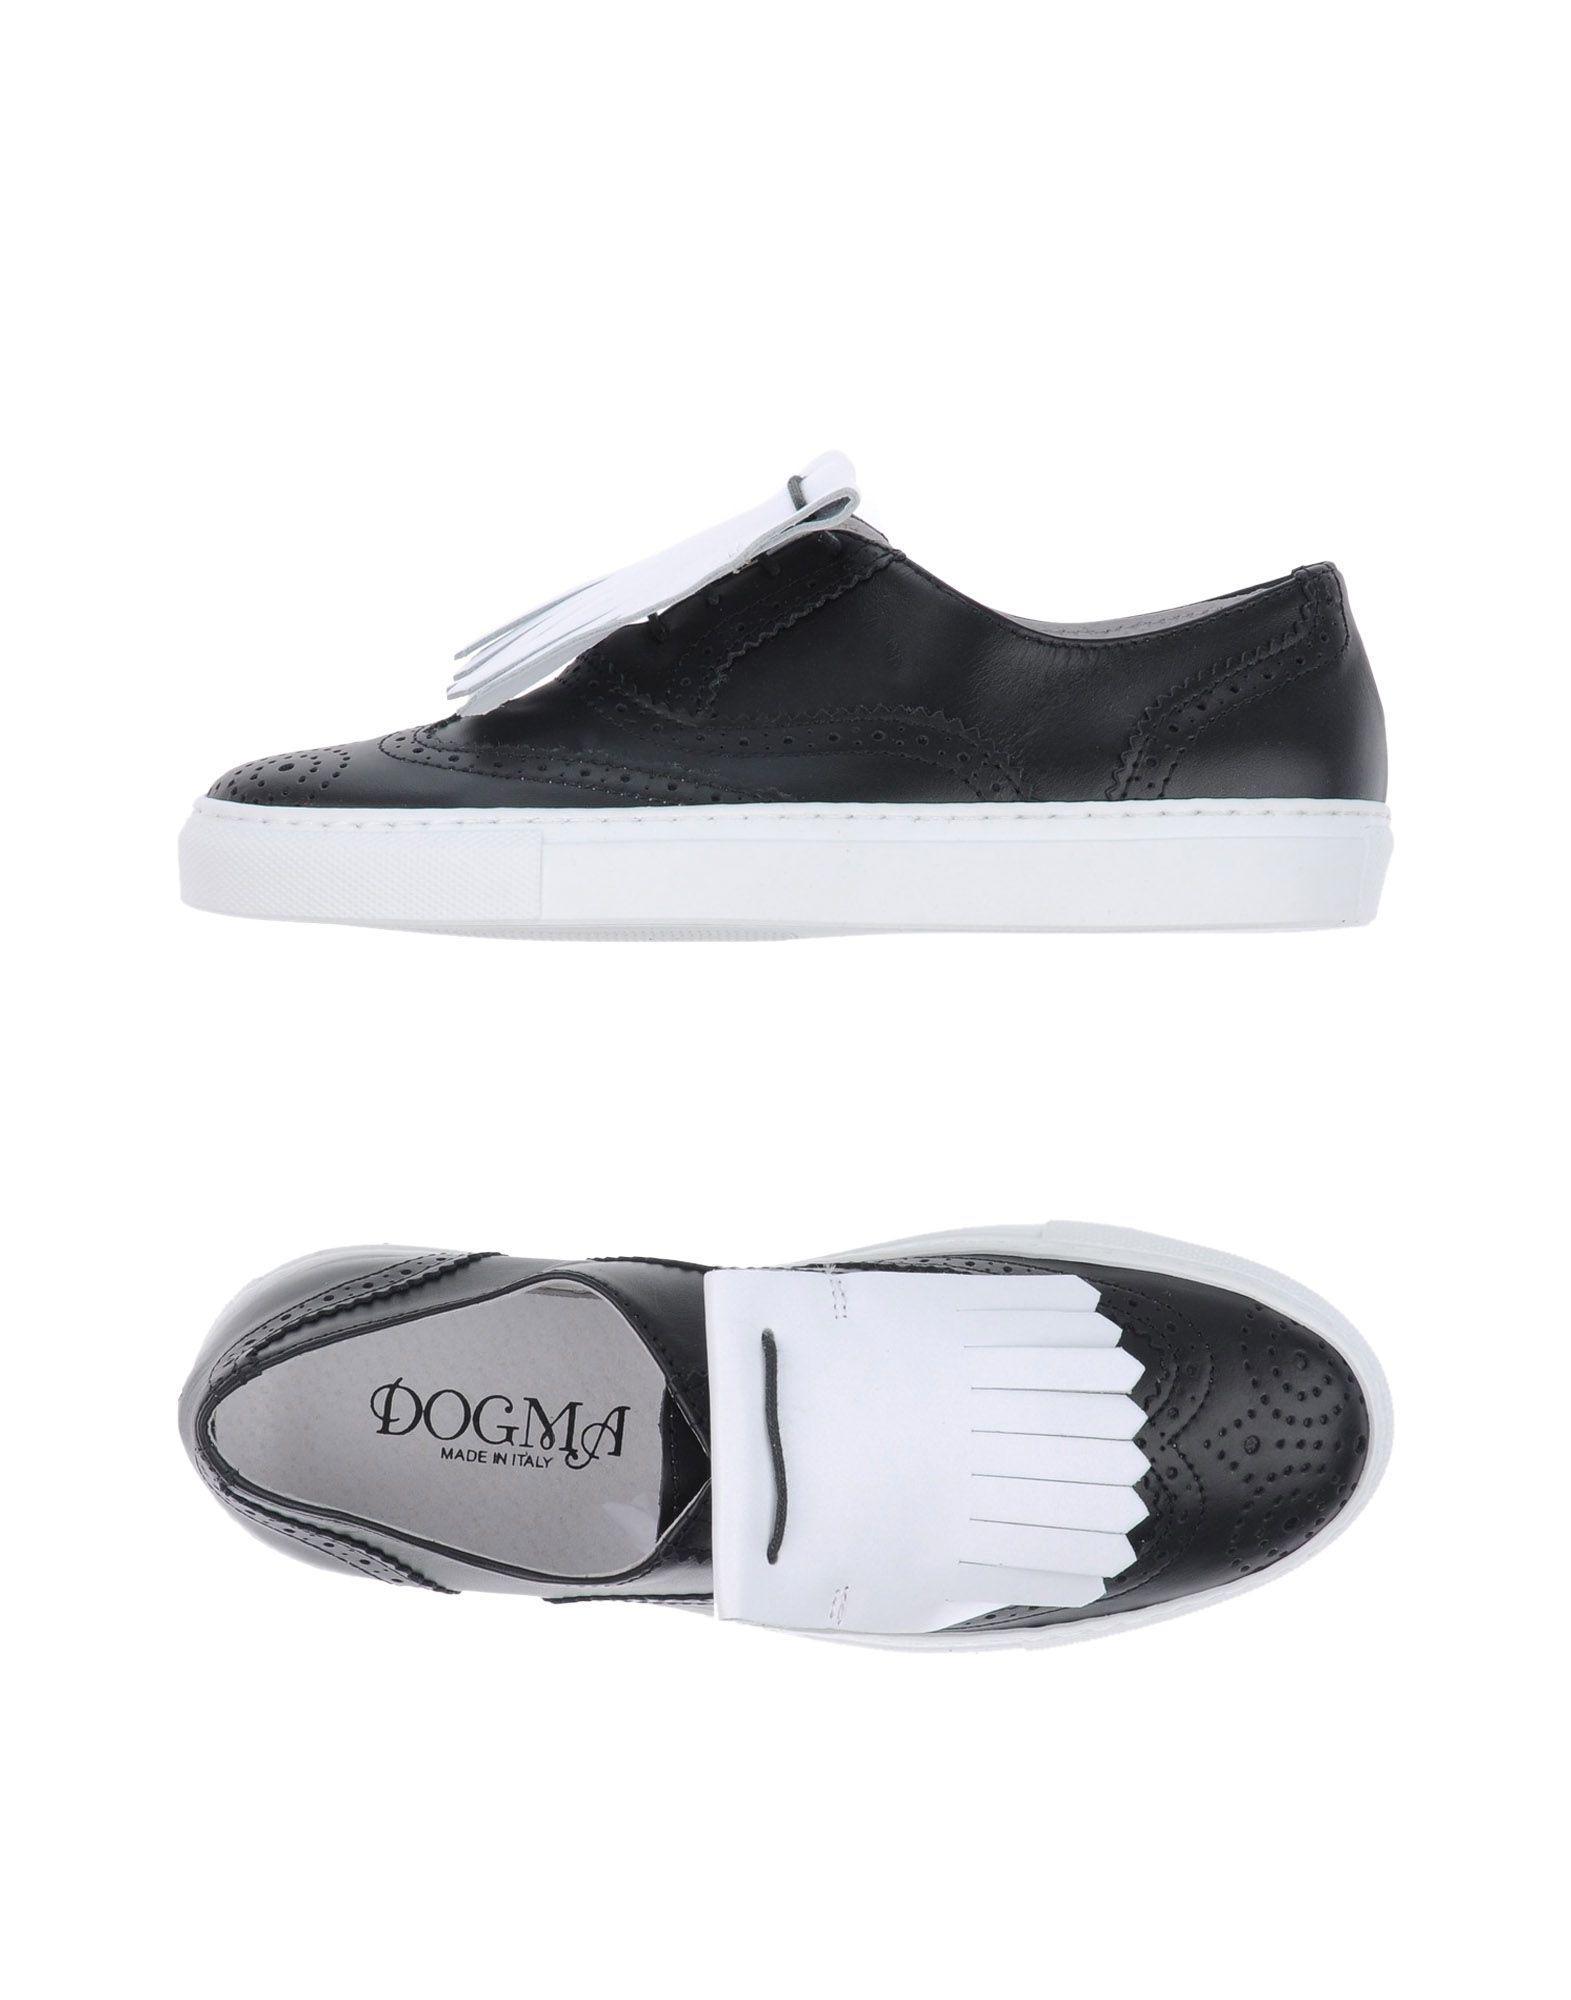 FOOTWEAR - Low-tops & sneakers Dogma oFxzUrfY